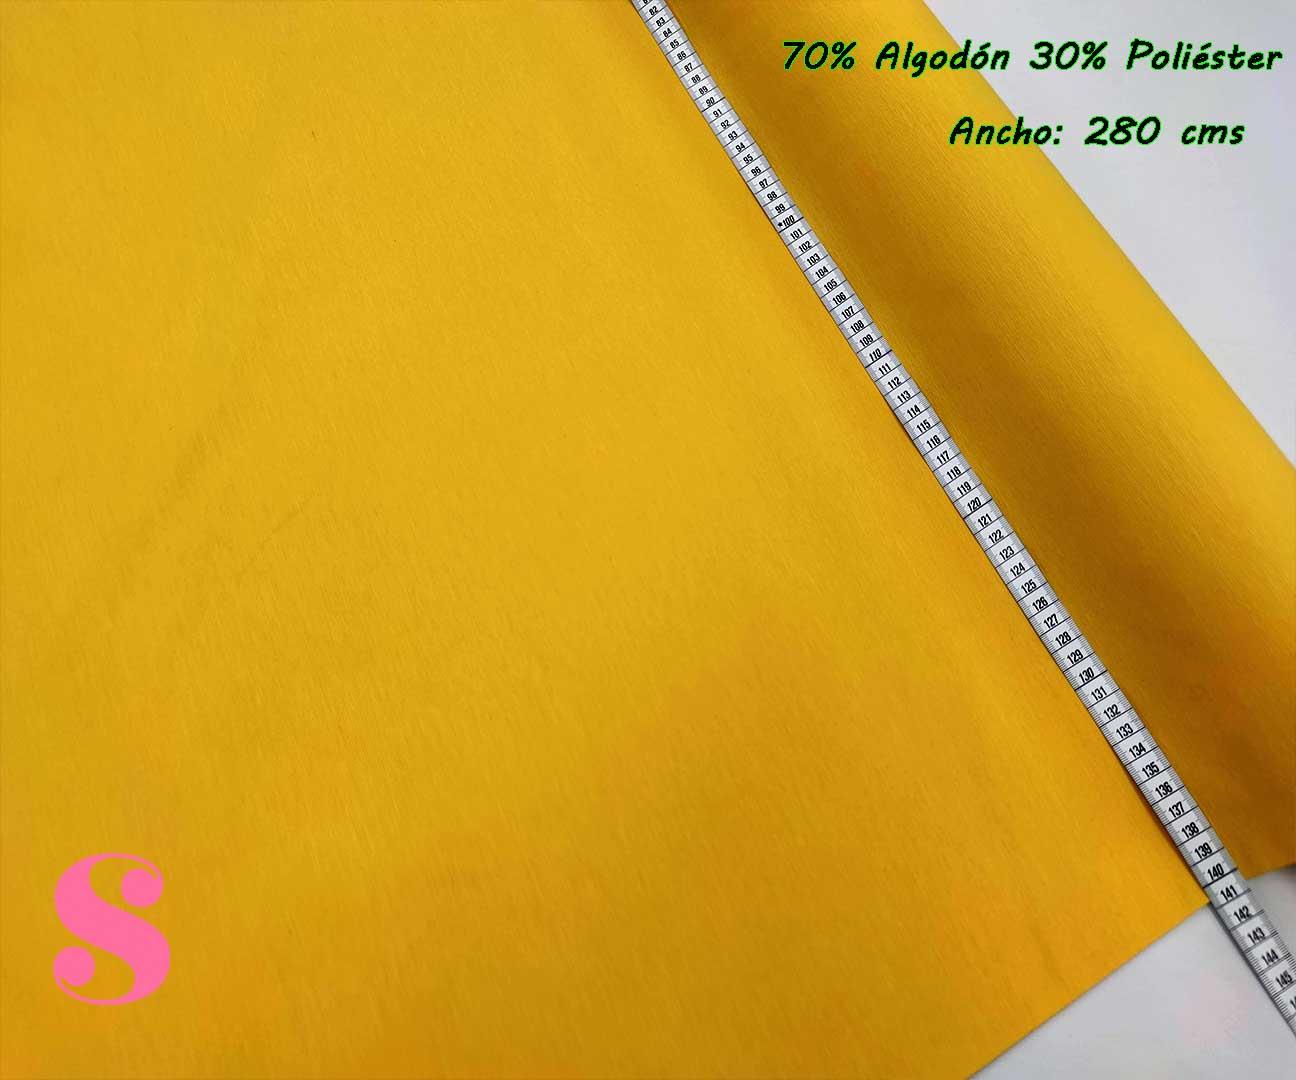 lonetas-de-buena-calidad,lonetas-de-exterior,lonetas-lisas-Loneta Lisa Amarilla